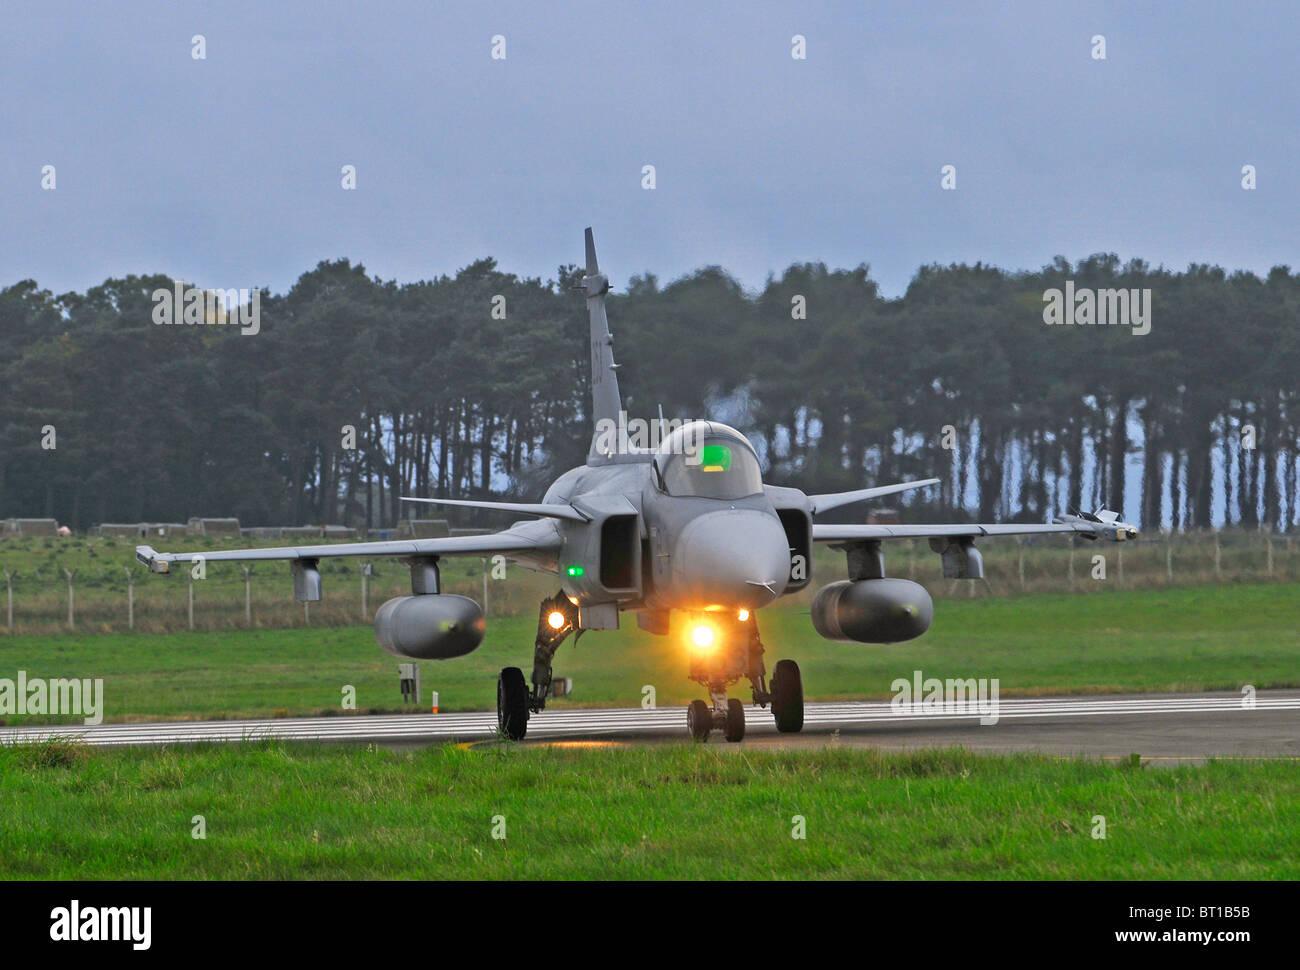 Saab JAS 39 Gripen single engined fast military Swedish jet fighter aircraft.  SCO 6855 Stock Photo